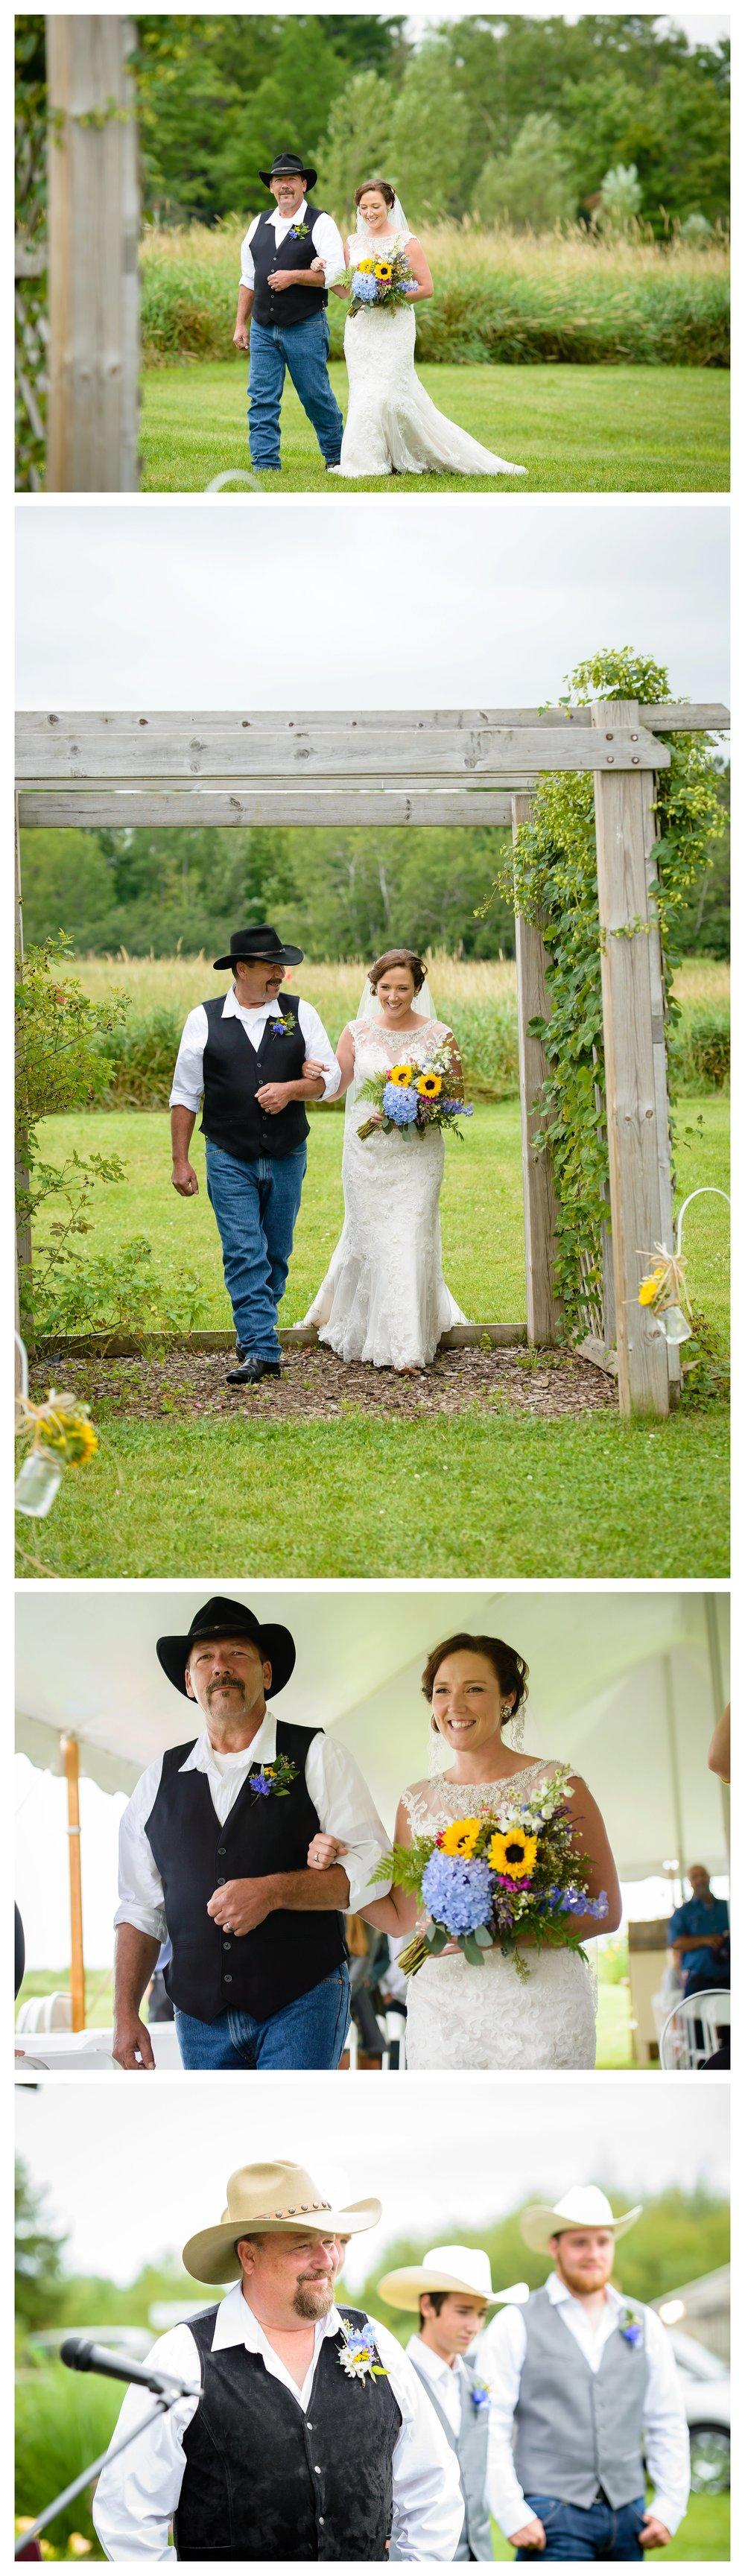 ps 139 photography jen jensen ashland freehands farm wedding northwoods_0031.jpg